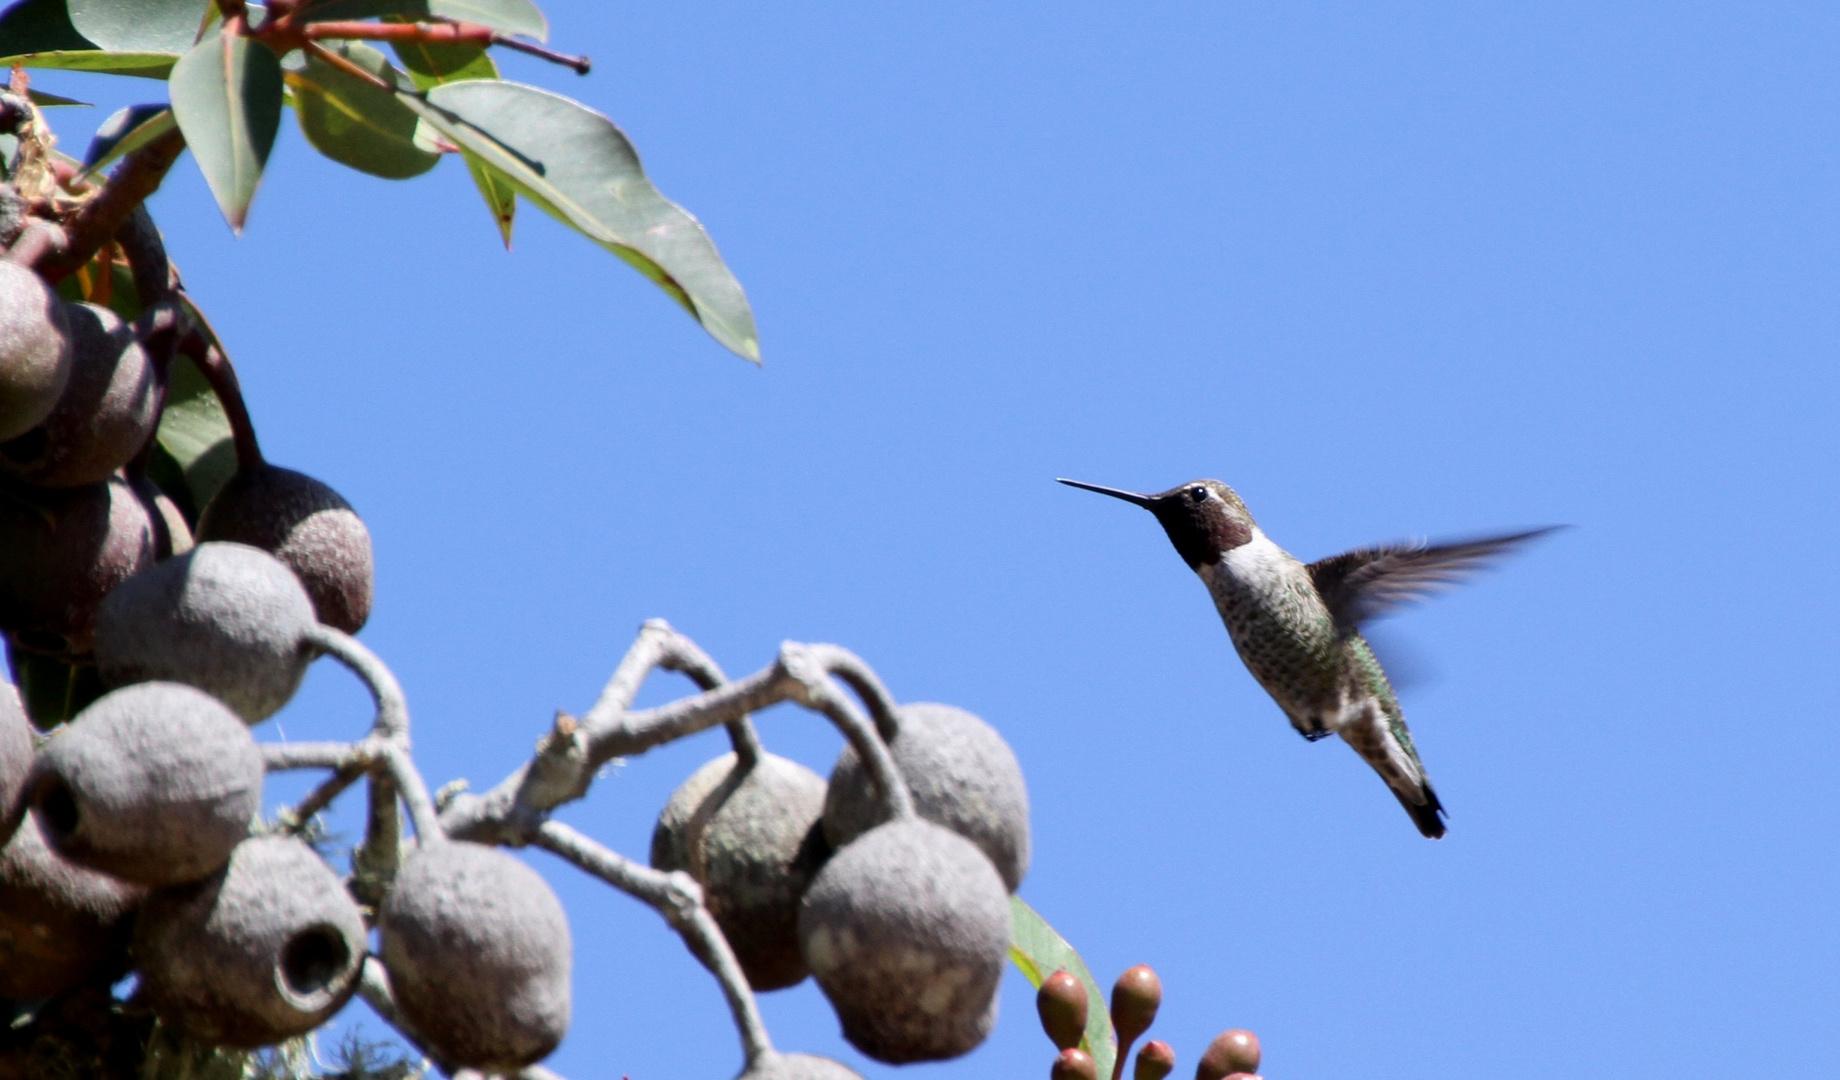 Kolibri in flight